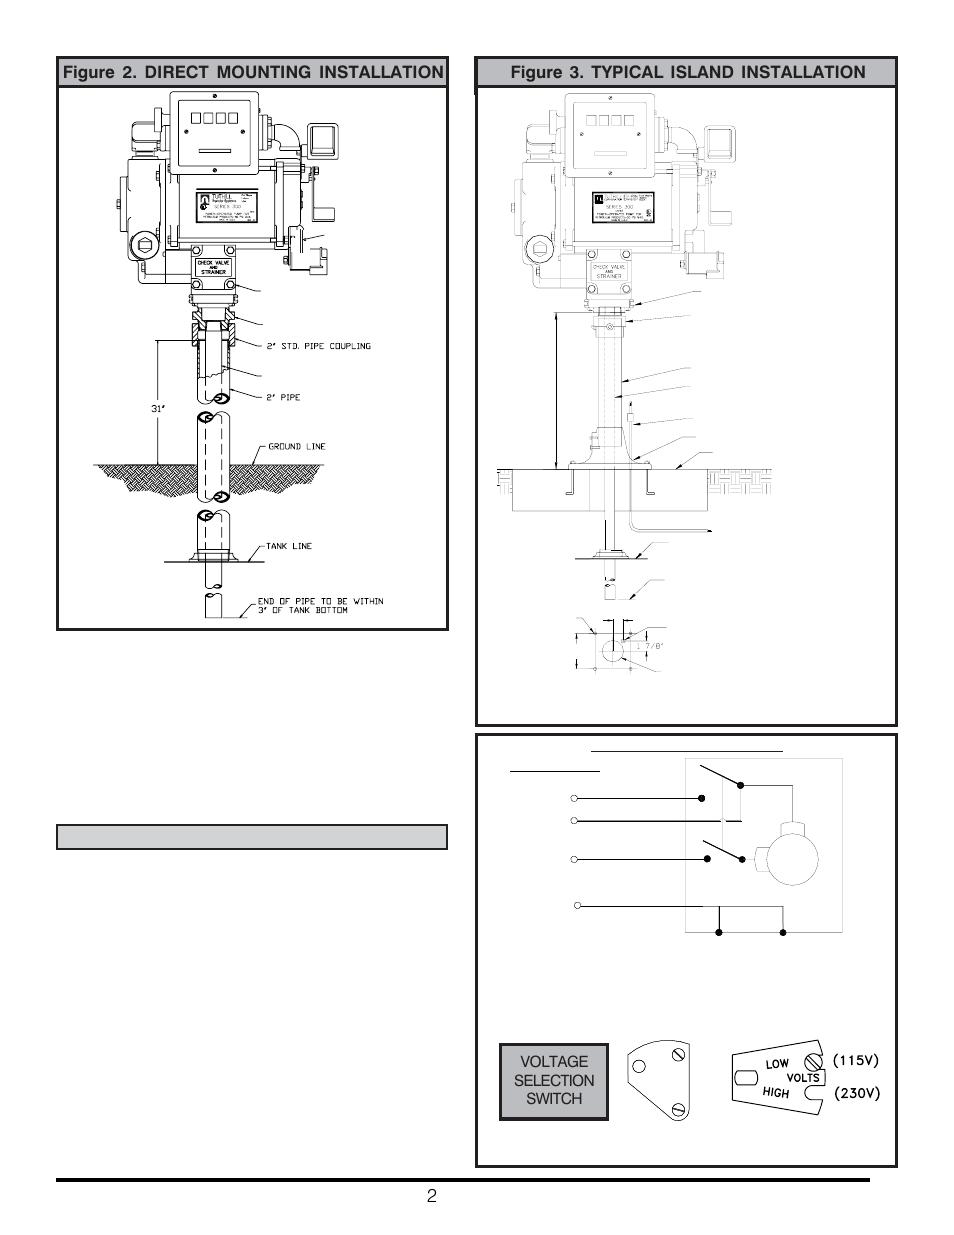 Figure 2. direct mounting installation, Warning